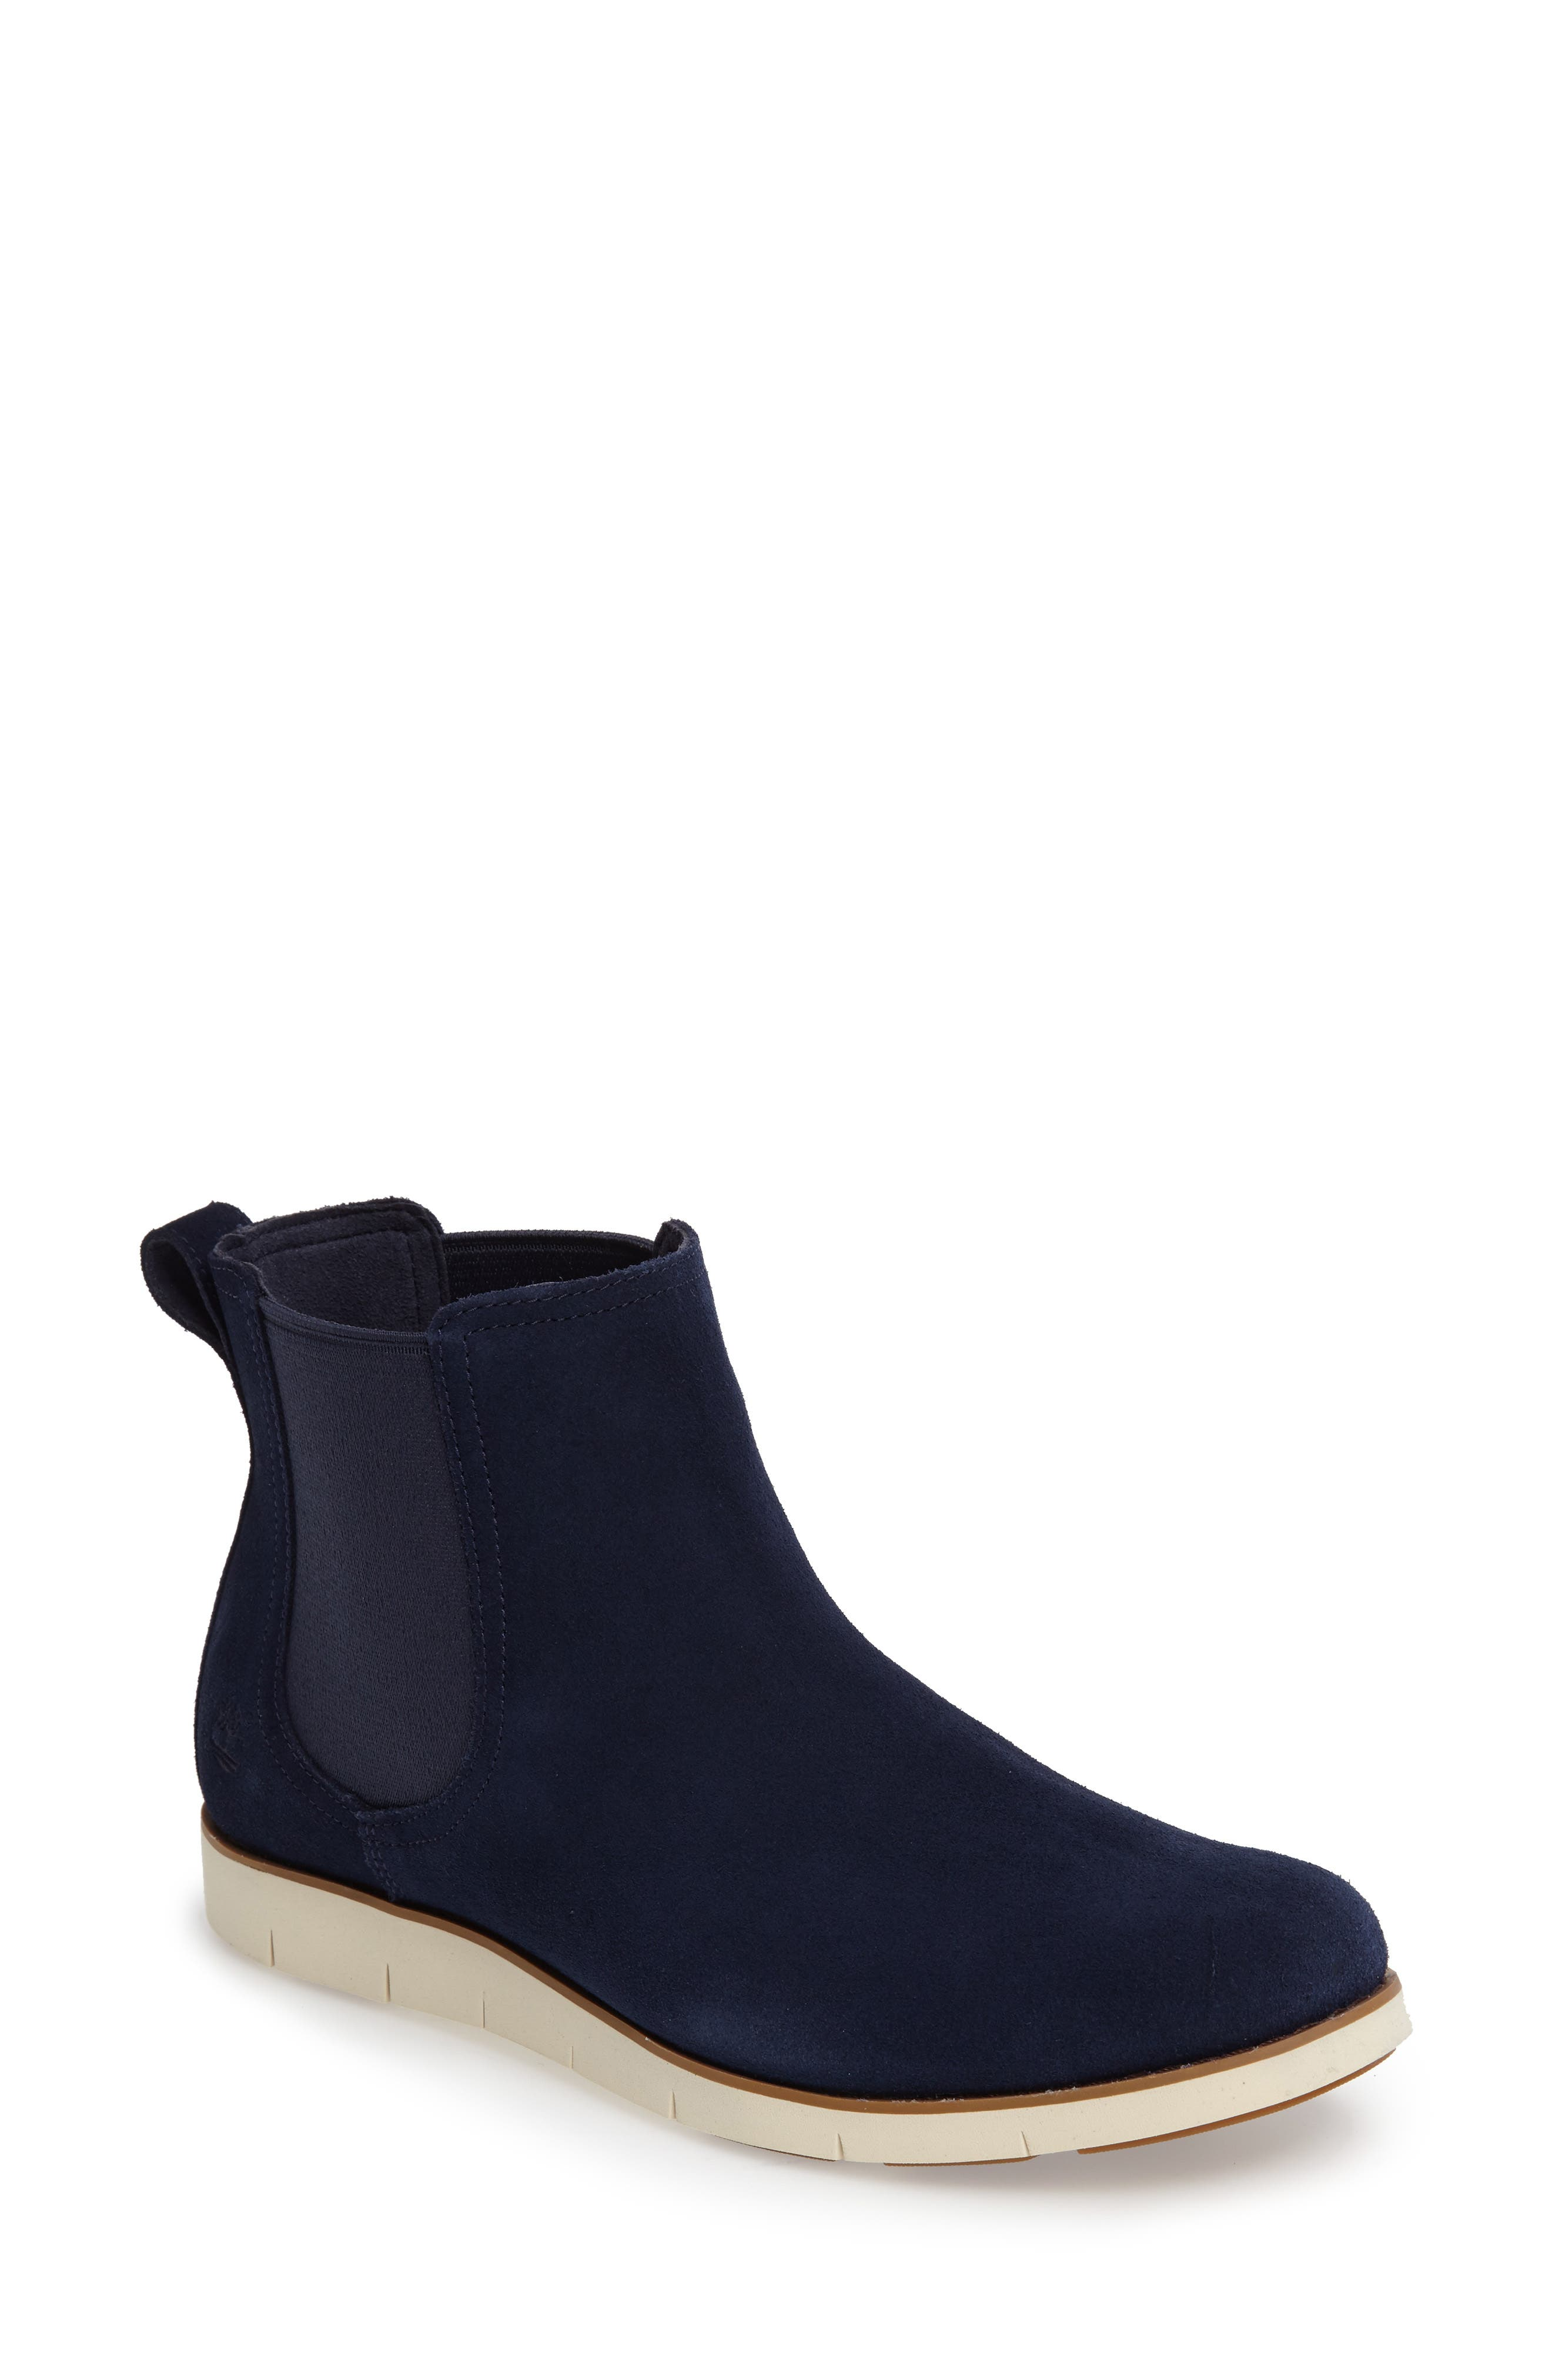 Lakeville Chelsea Boot,                         Main,                         color,